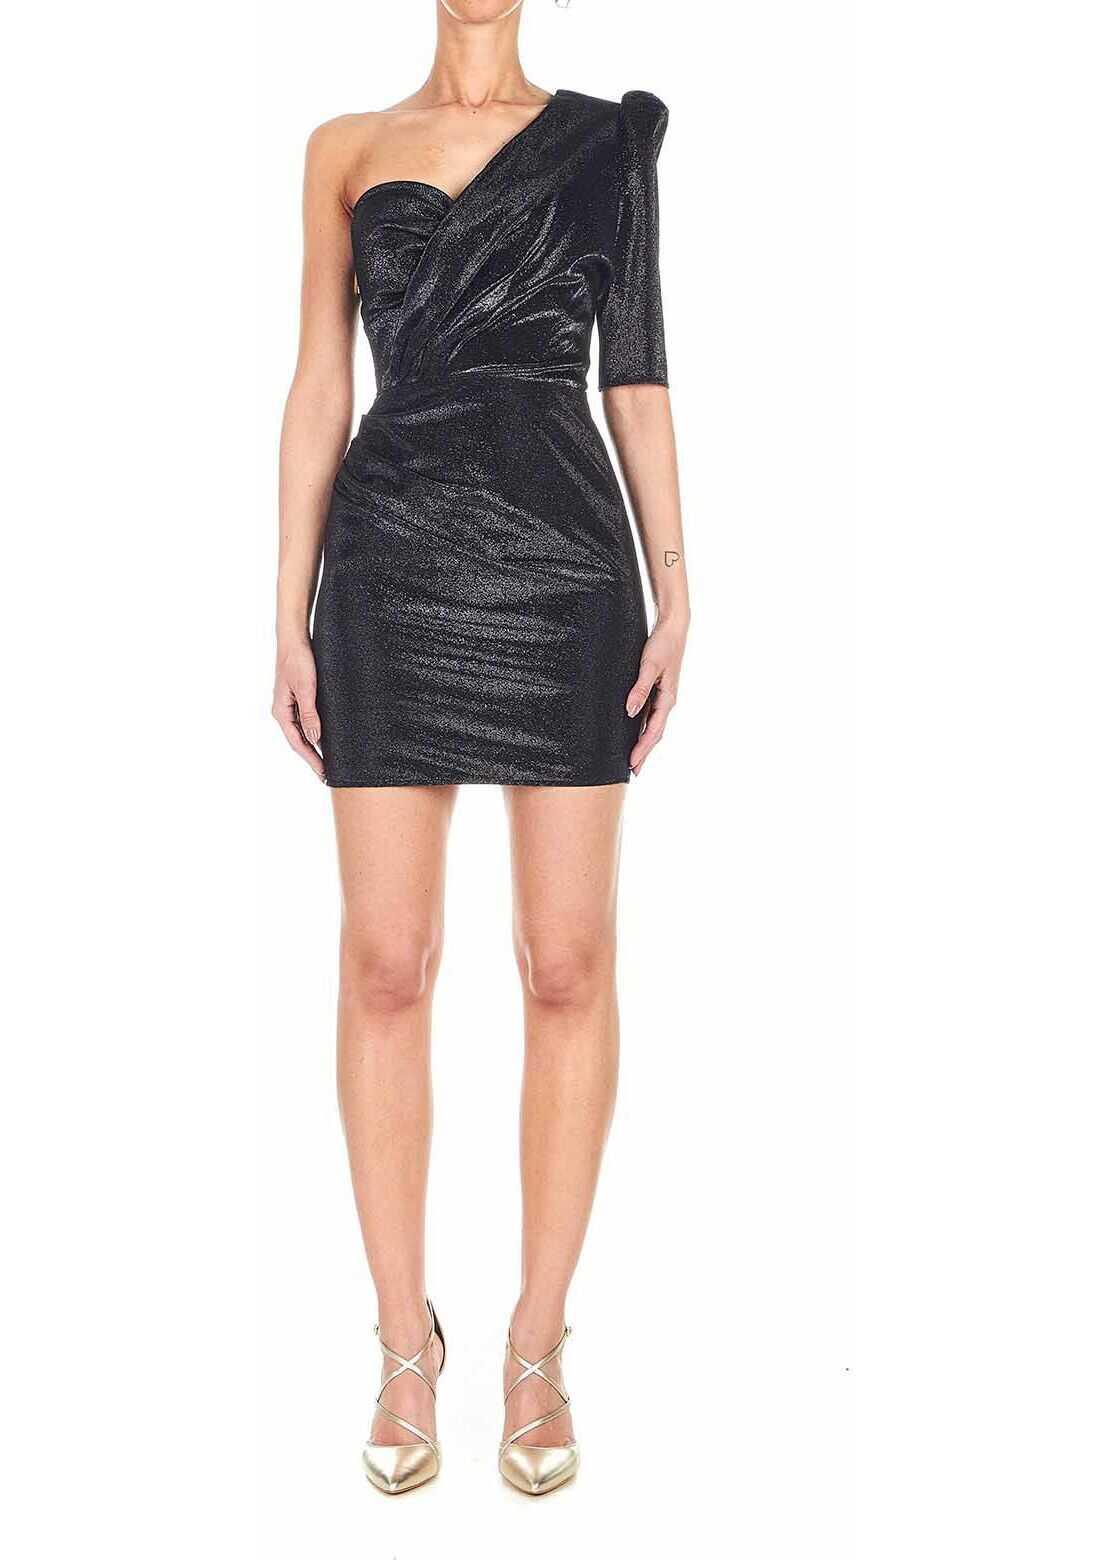 Elisabetta Franchi Mini dress with glitter finish Black